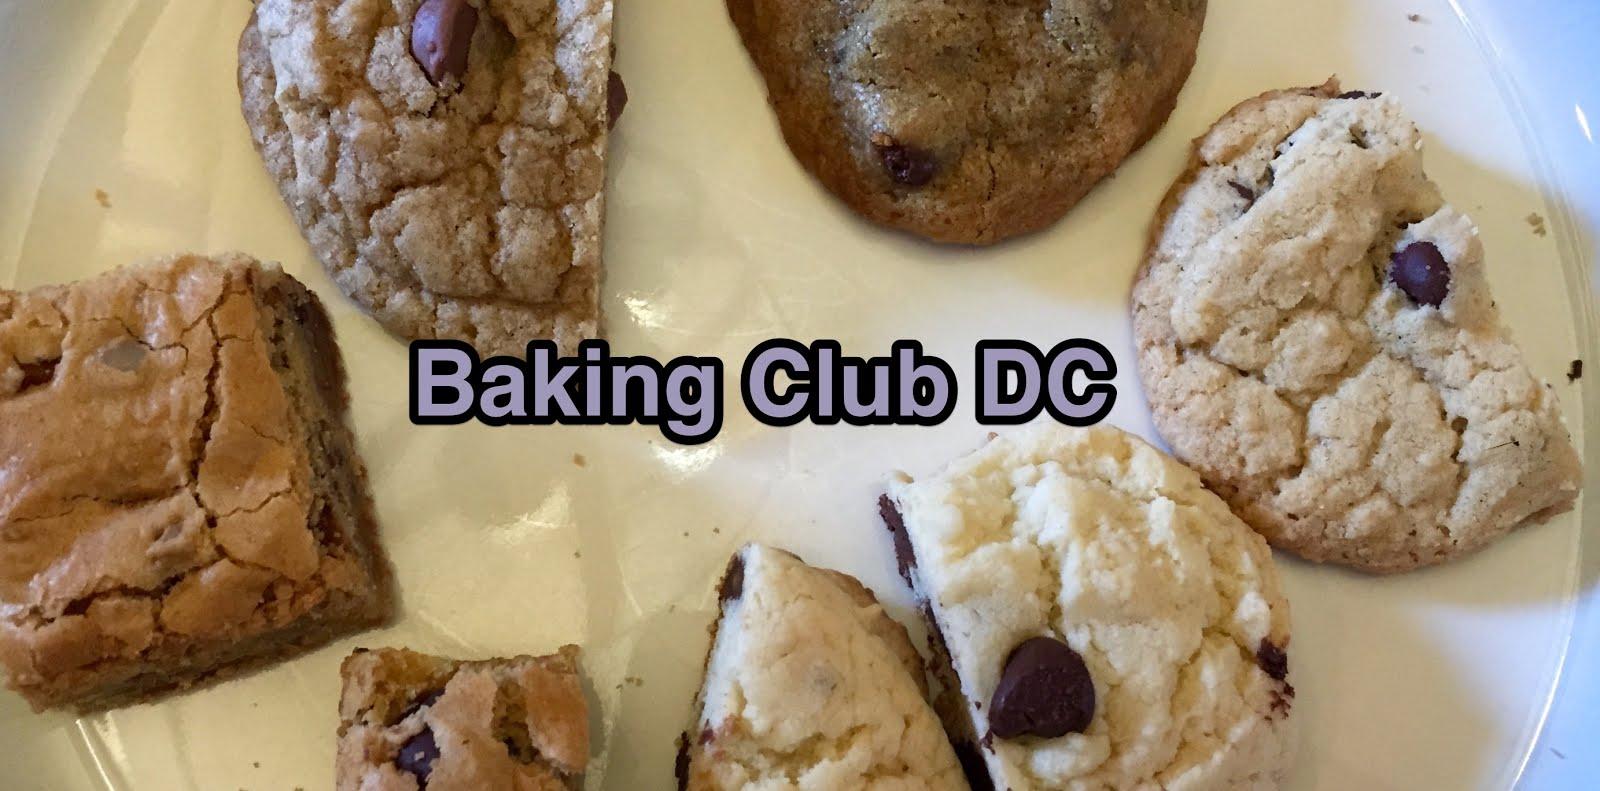 Baking Club